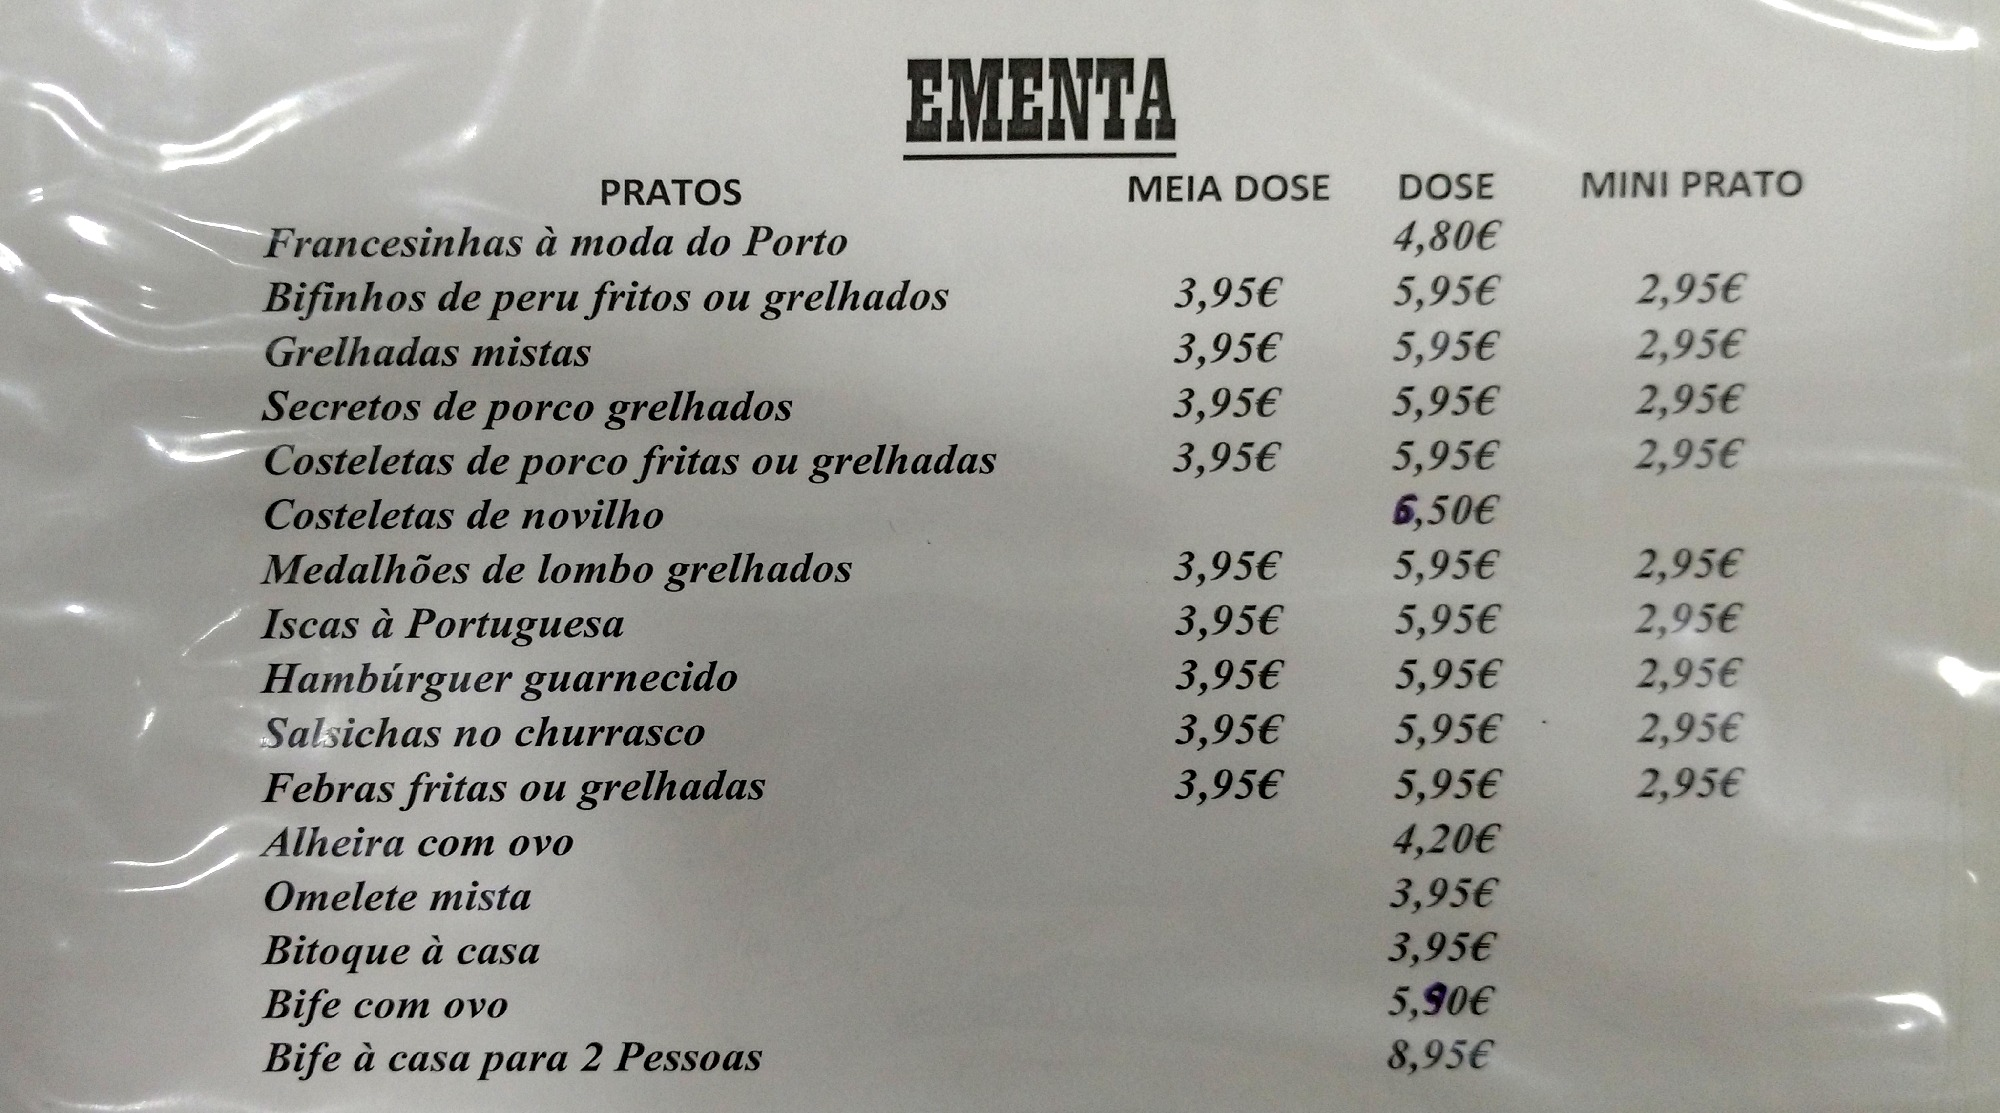 Menu restaurant portugais avec dose - demi-dose et mini-dose